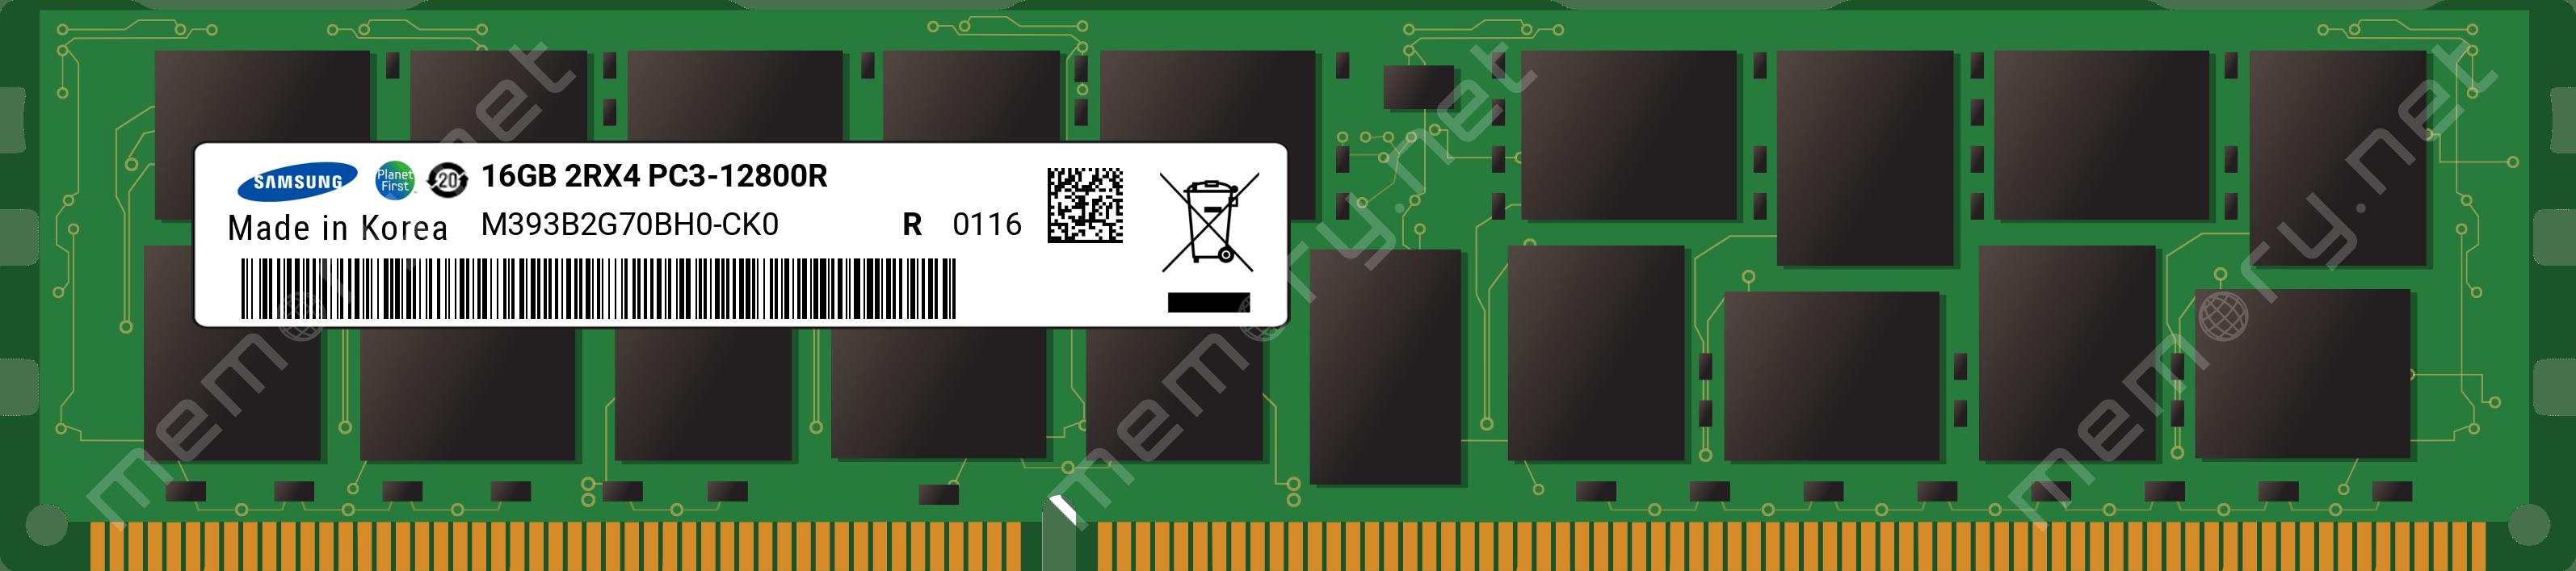 Samsung PC3-12800R 16GB 2Rx4 DDR3  M393B2G70BH0-CK0 Server Memory *SHIPS FAST